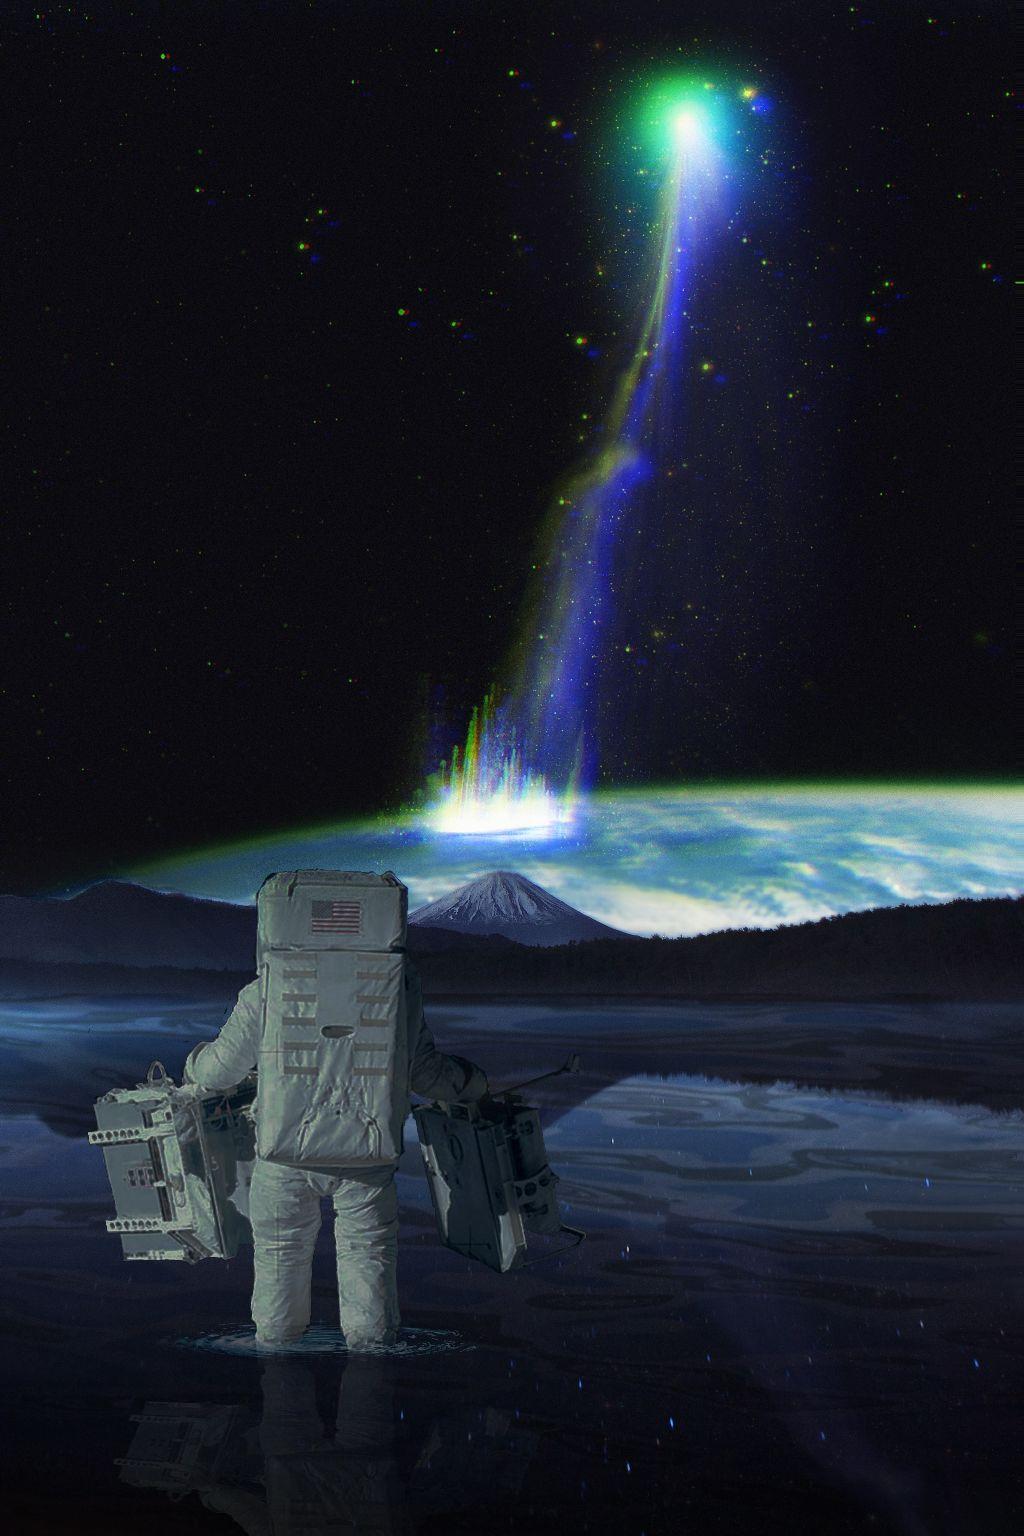 #freetoedit #astronaut #water #space  #earth #light #ftestickers #background #glitcheffect #picsarteffects #picsart #remixed #remixme #remixit